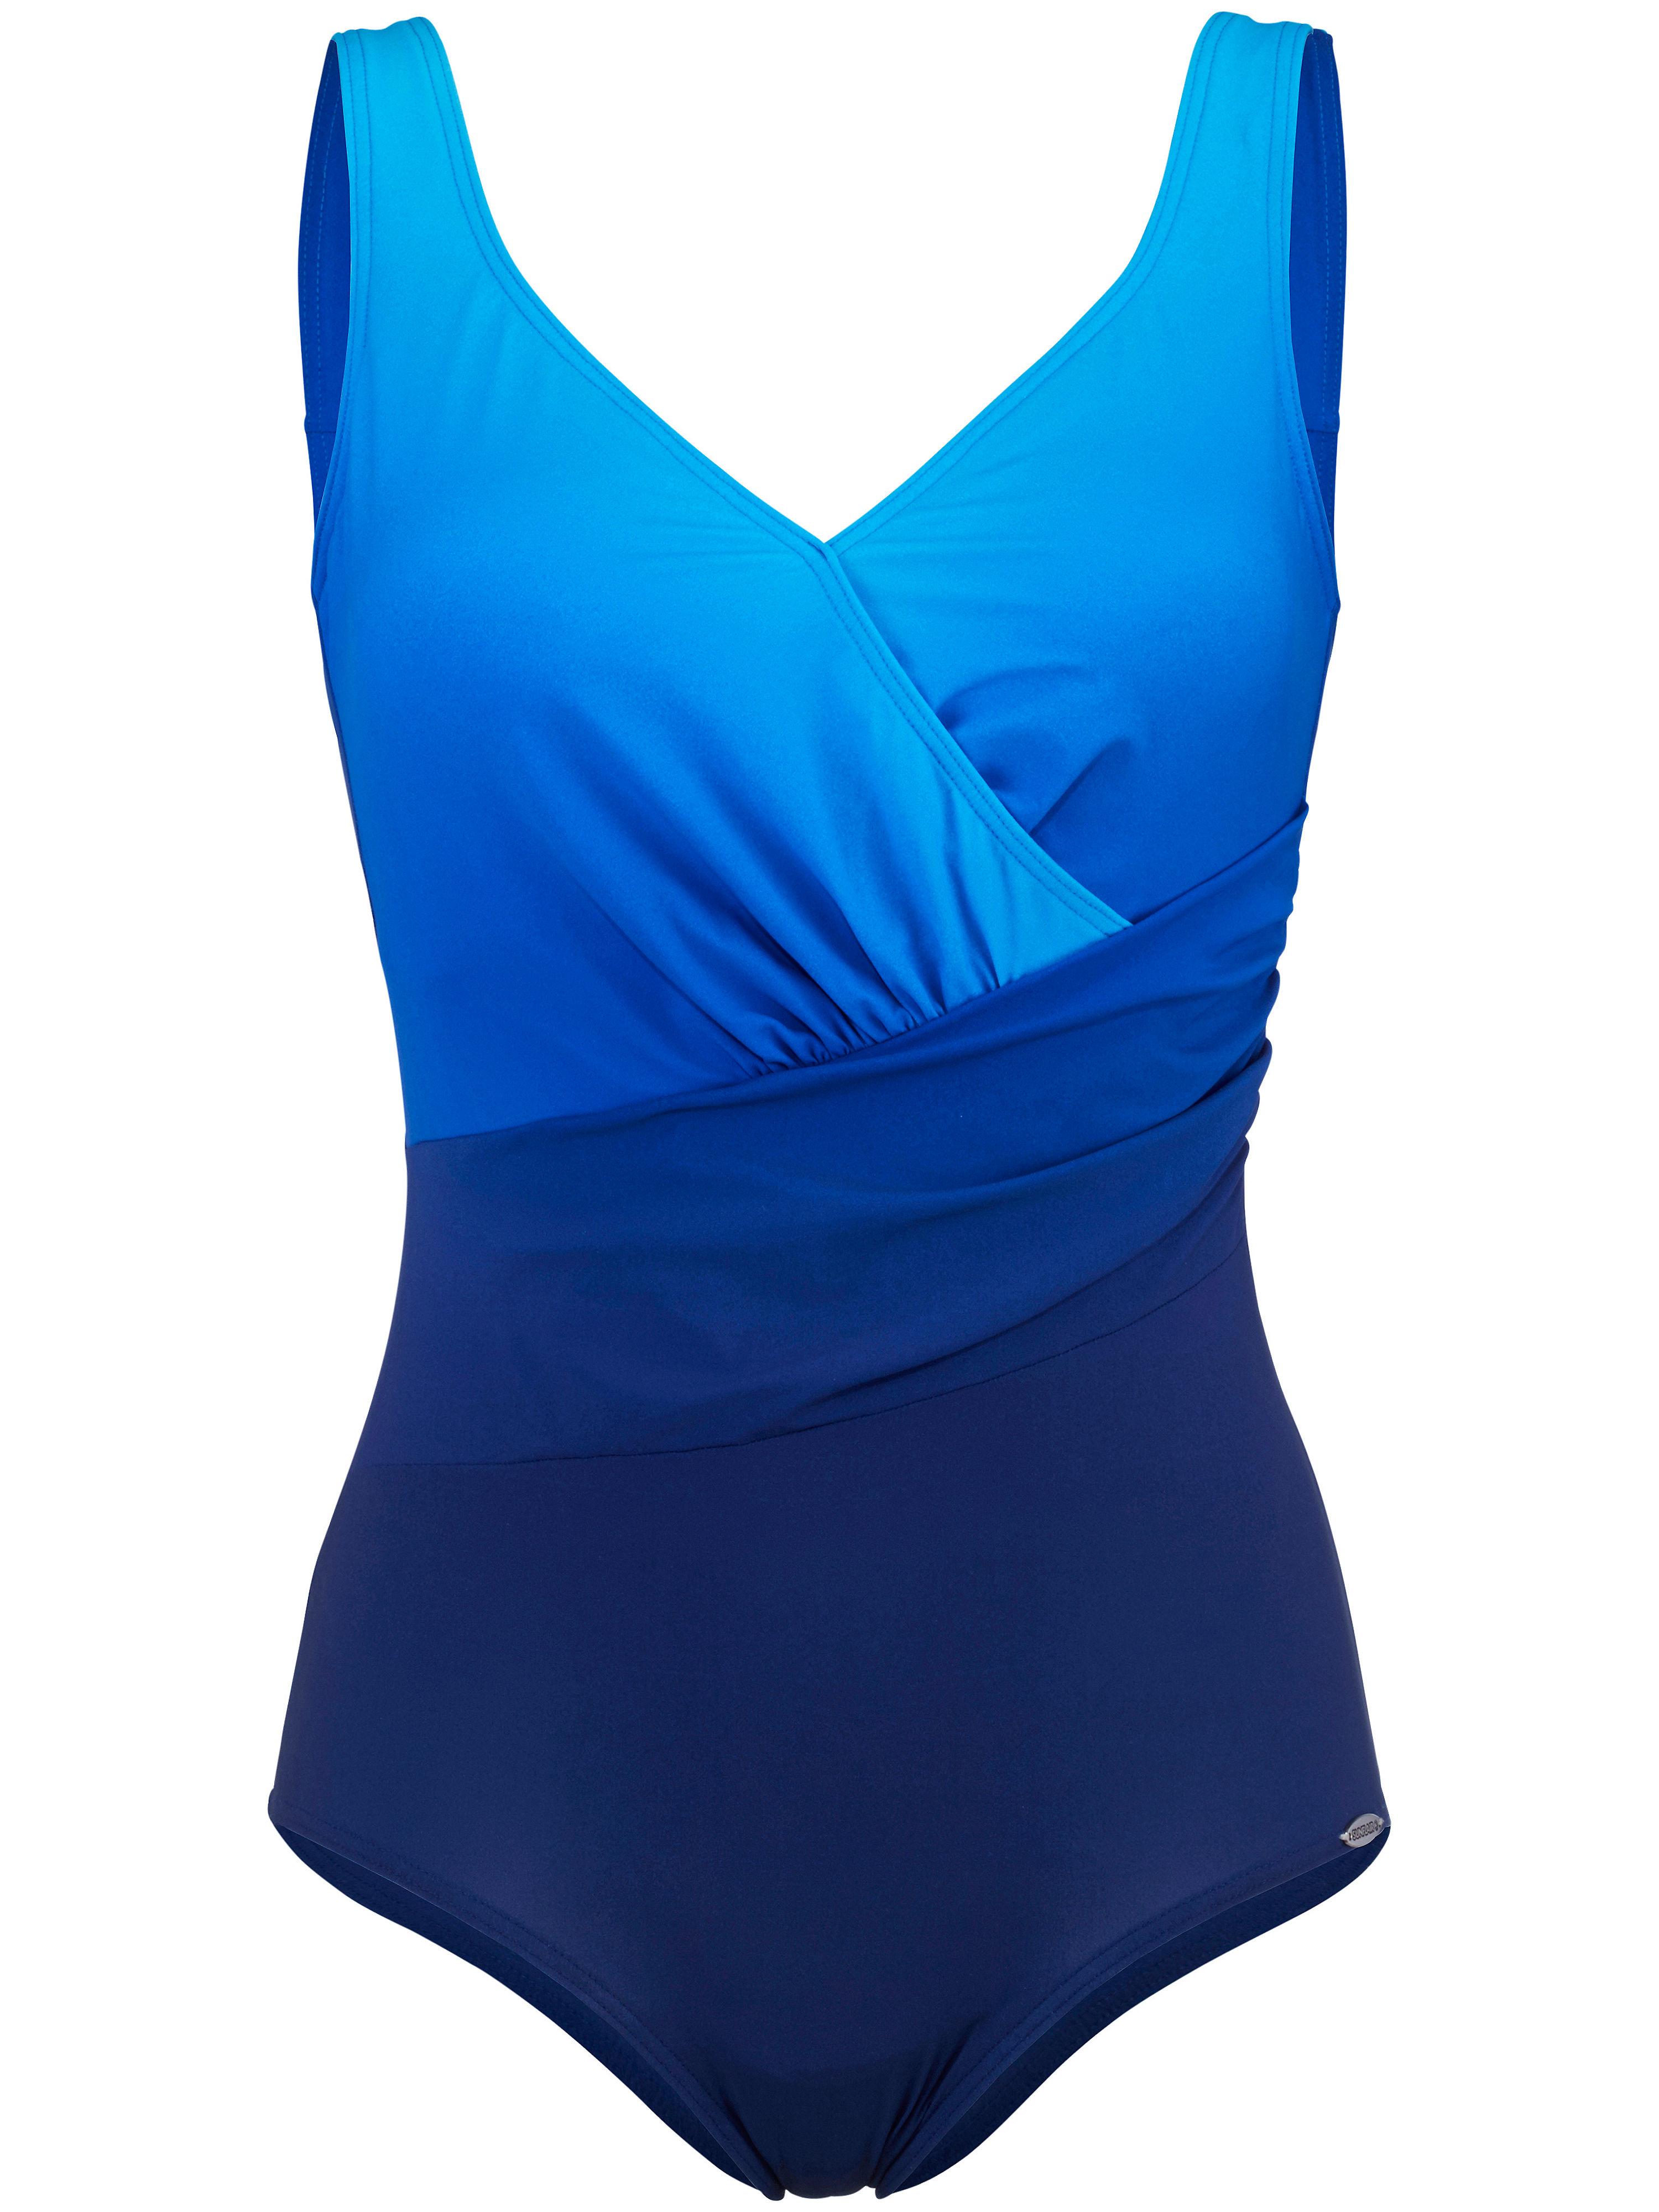 Badpak Van Sunflair Sensitive blauw